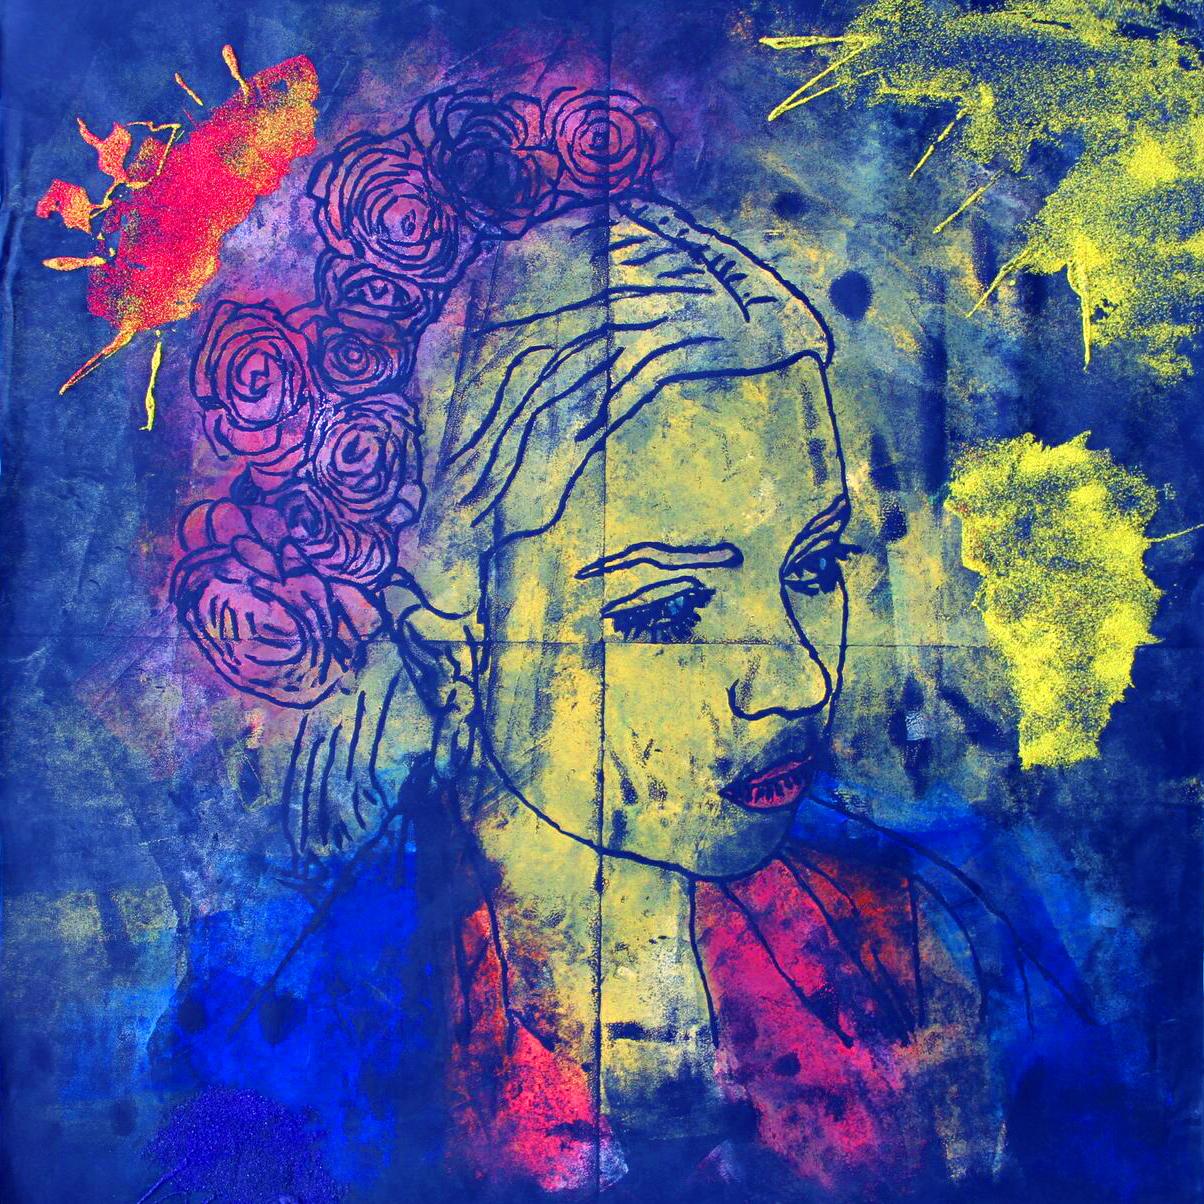 Blue Portrait Limited Edition Giclee Print by Natasha Nejman